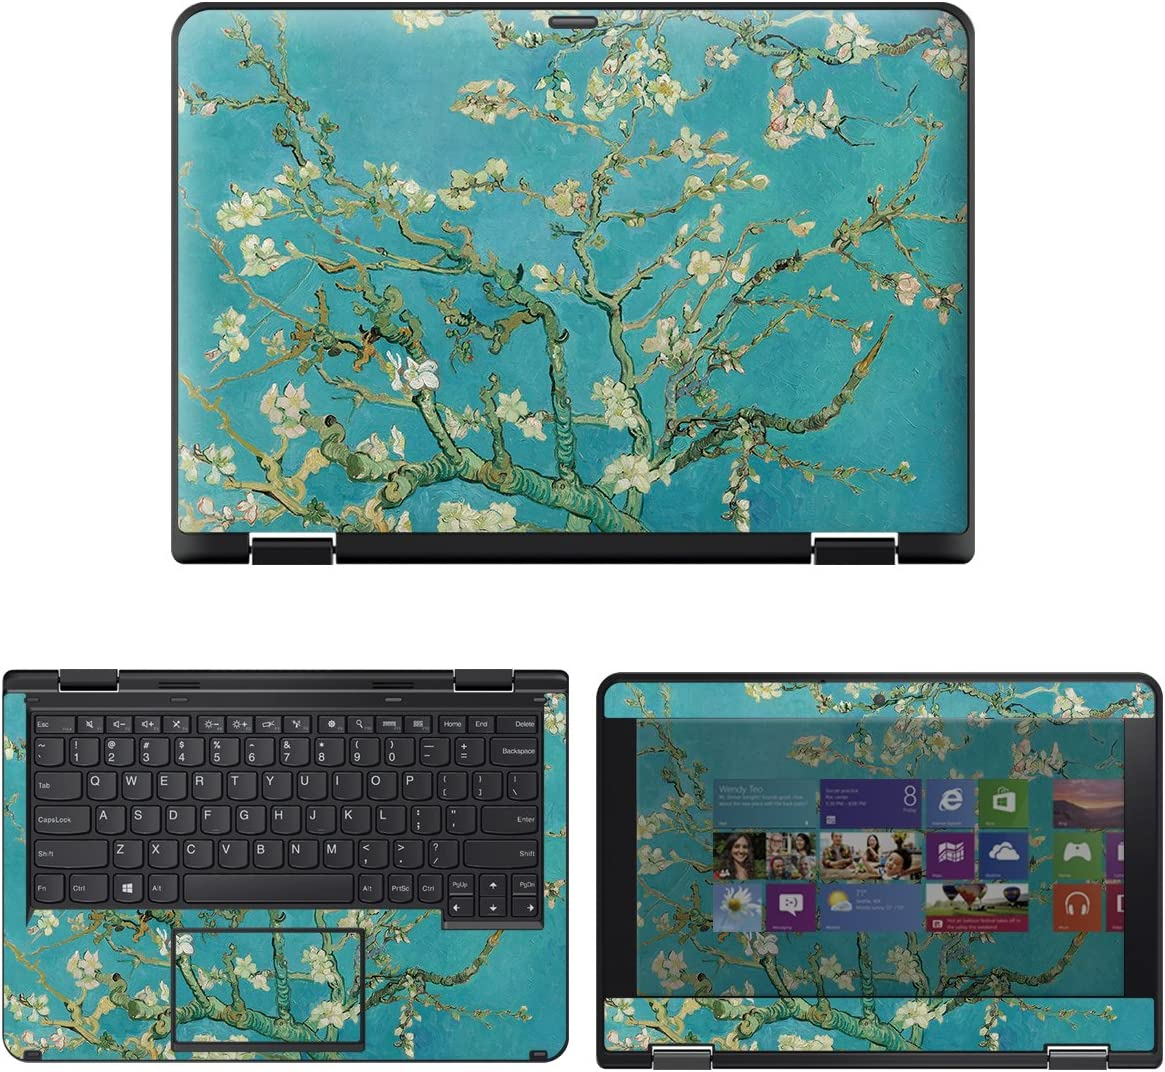 "decalrus - Protective Decal Floral Skin Sticker for Lenovo ThinkPad Yoga 11e (4th Gen.) (11.6"" Screen) case Cover wrap LEthinkkpadYoga11E_4G-230"